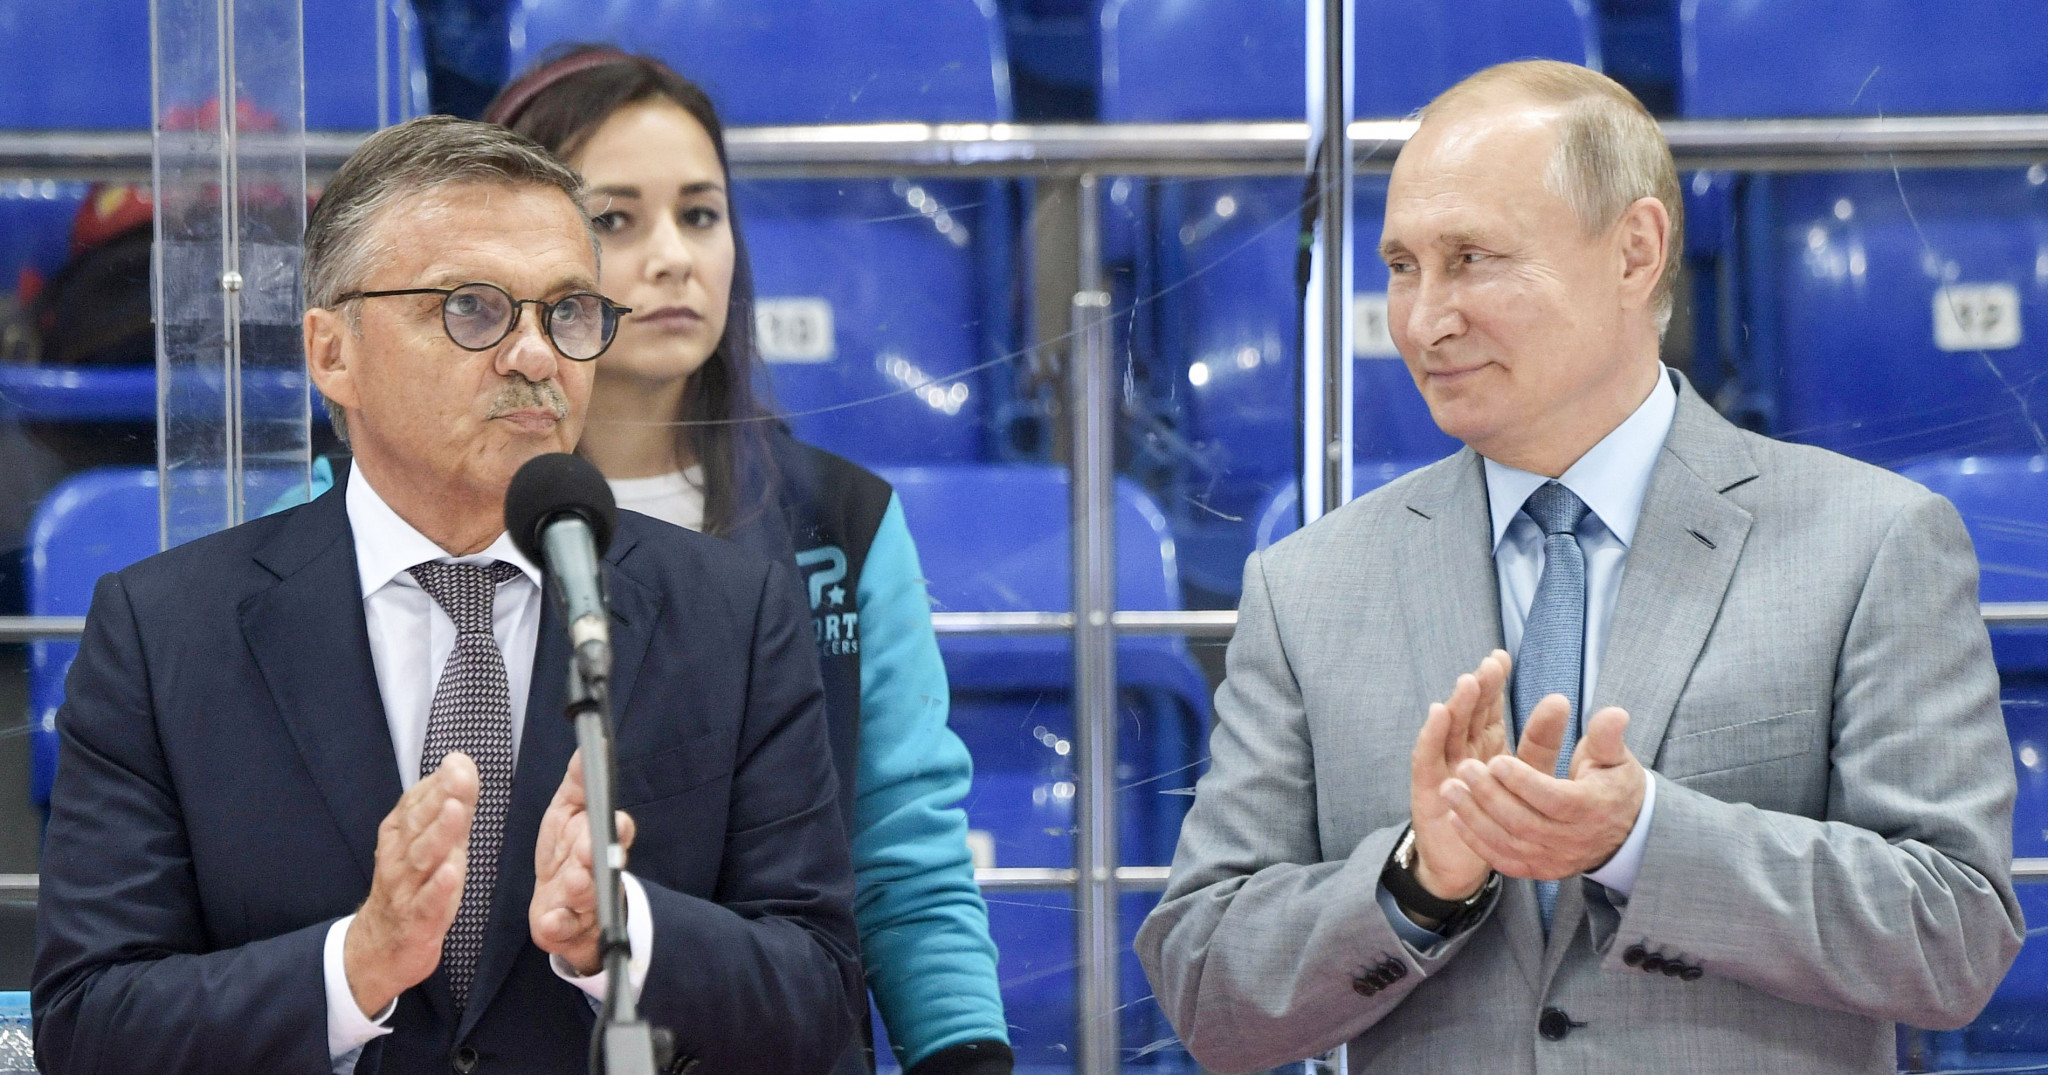 IIHF President René Fasel has claimed it will be